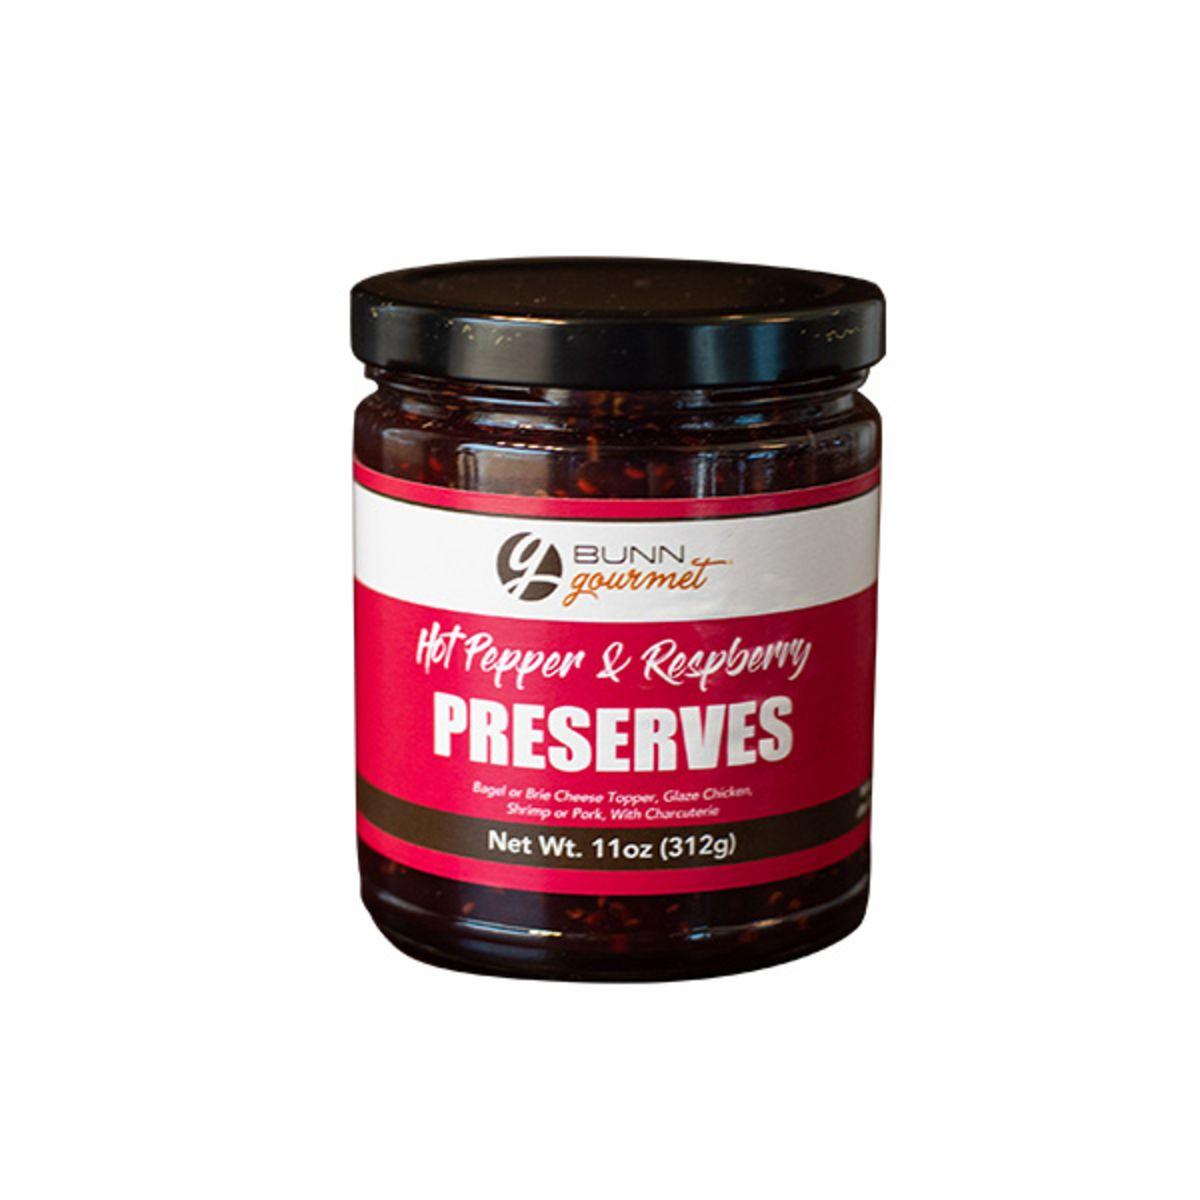 BUNN Gourmet Hot Pepper & Raspberry Preserves